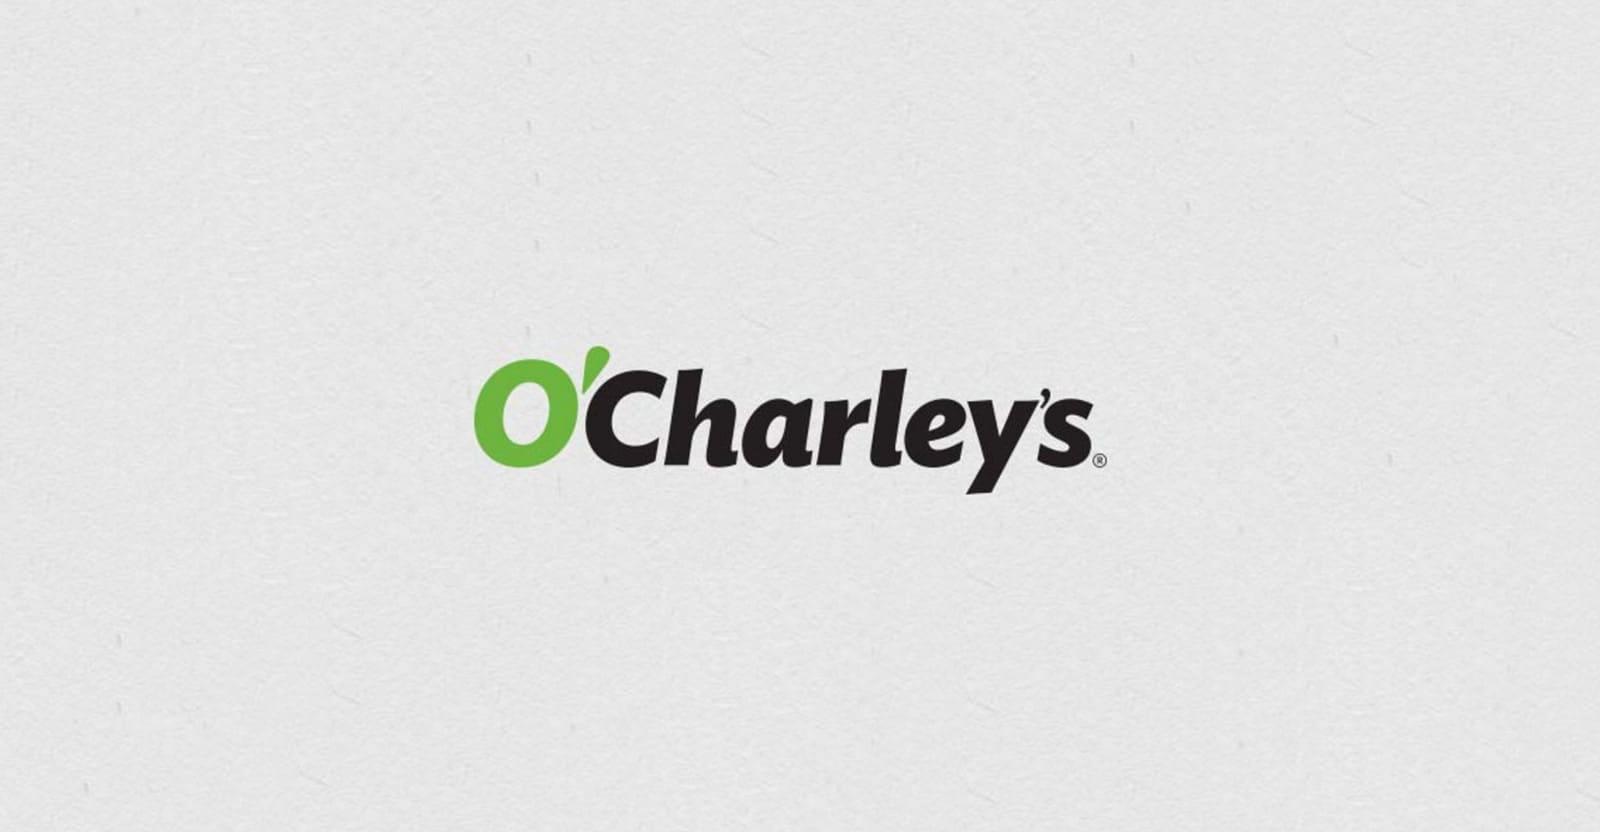 O'Charley's Gluten-Free menu